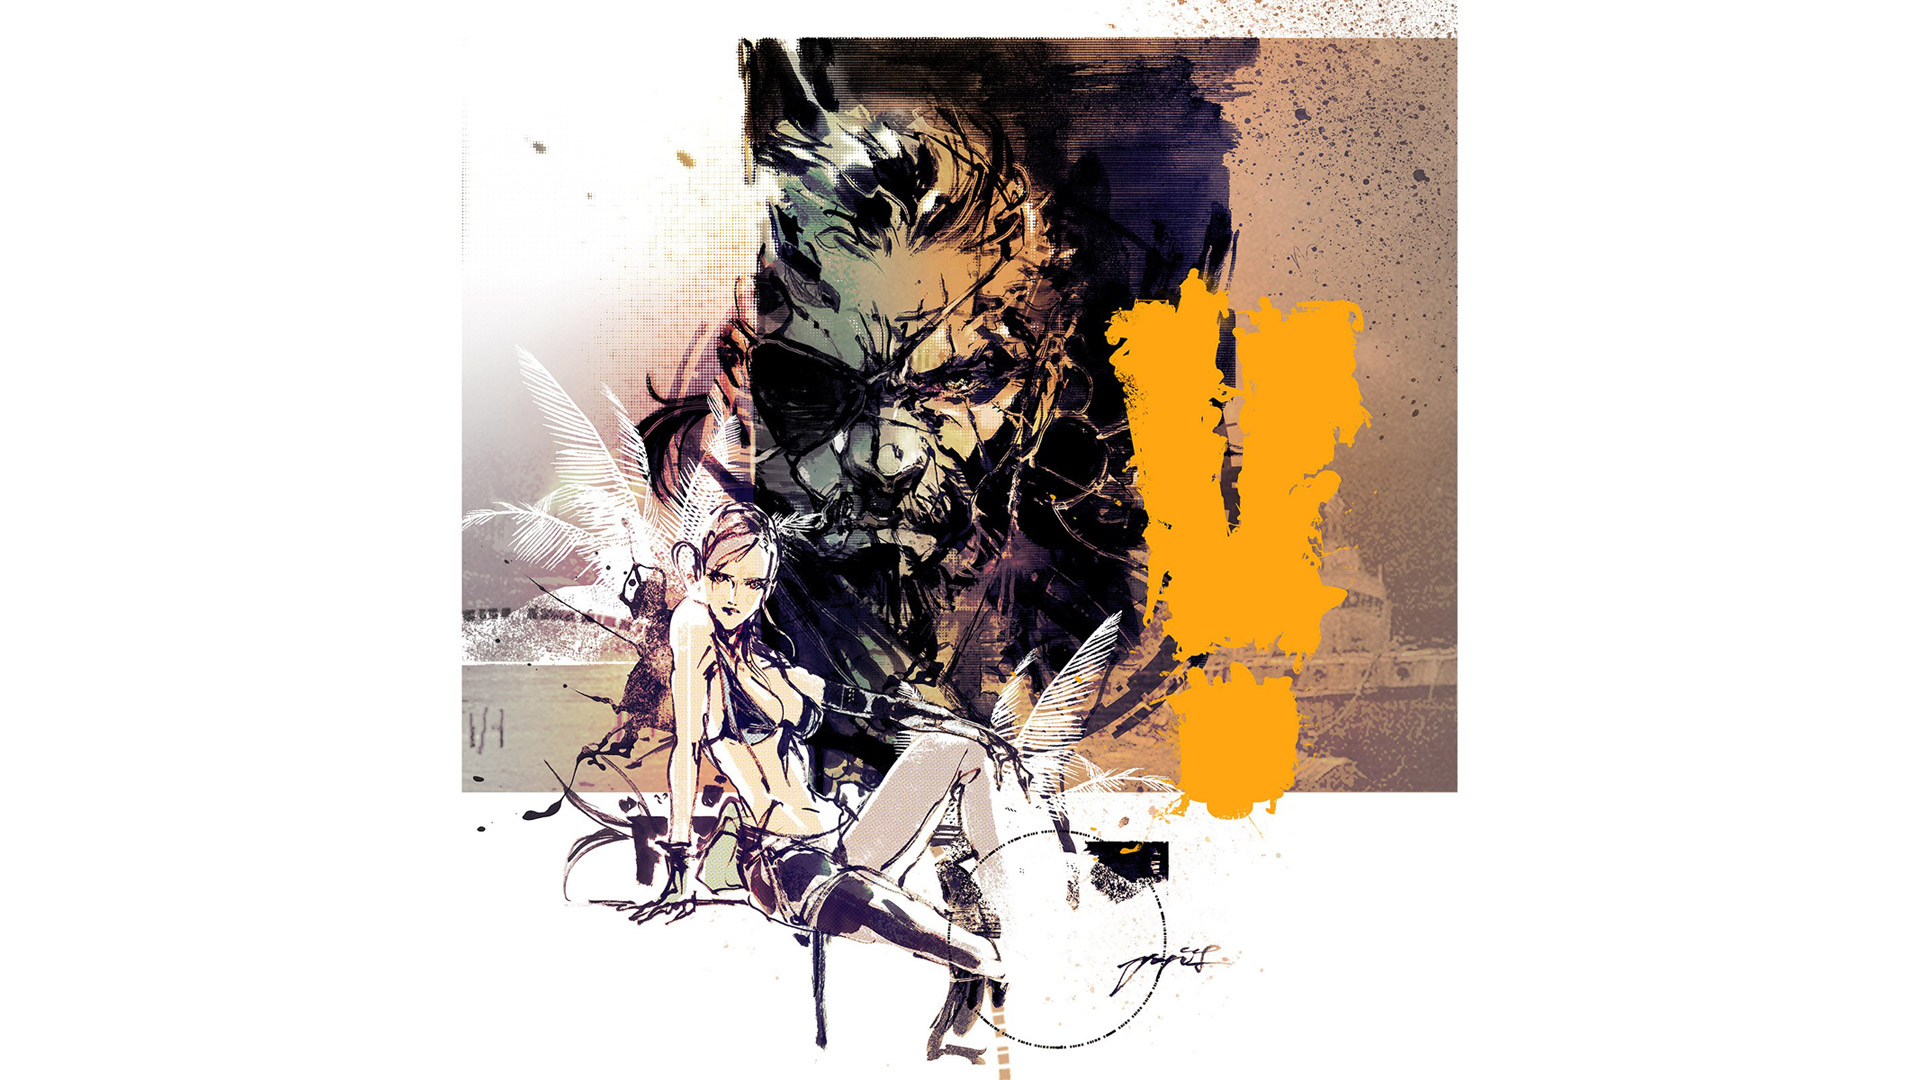 Metal Gear Solid V The Phantom Pain wallpaper 10